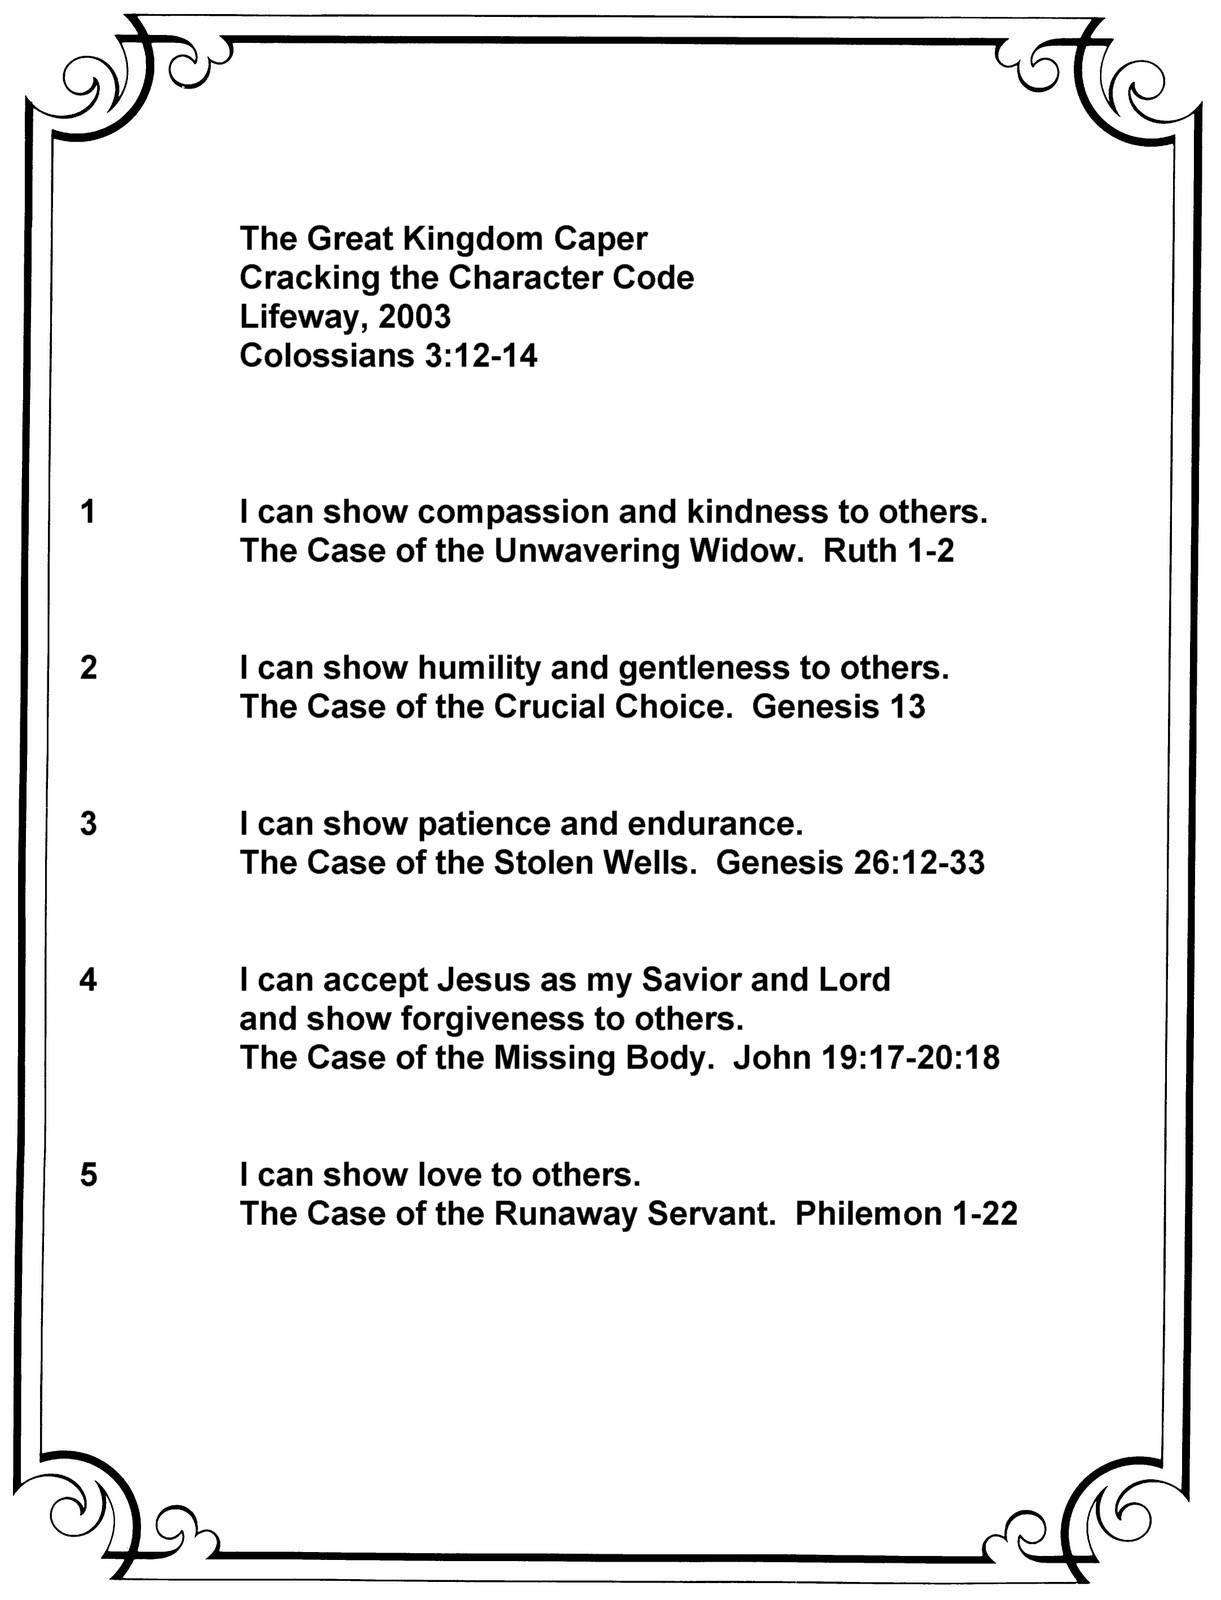 Great Kingdom Caper Summary